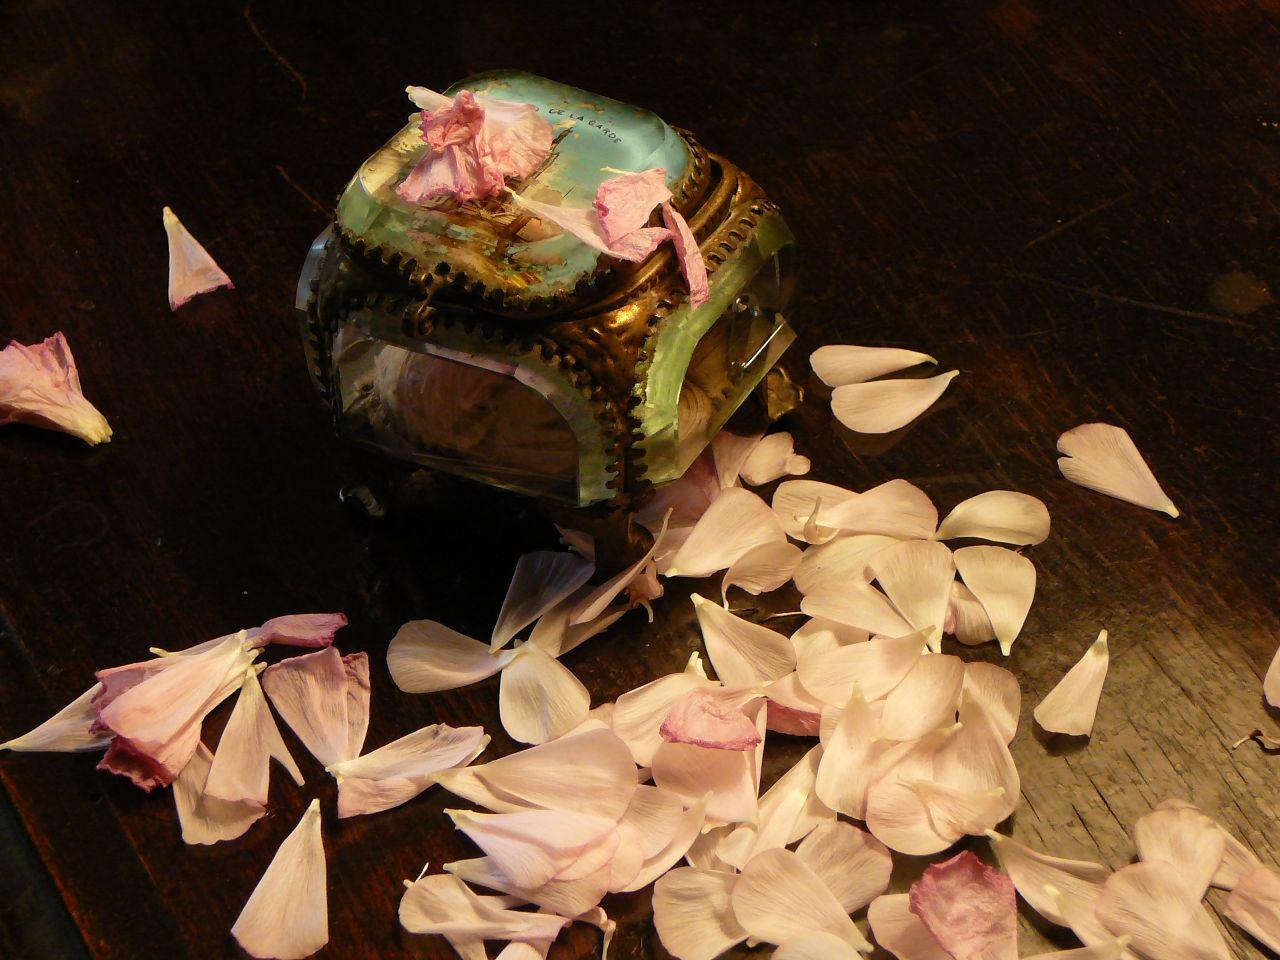 Valediction Forbidding Mourning Petals photo